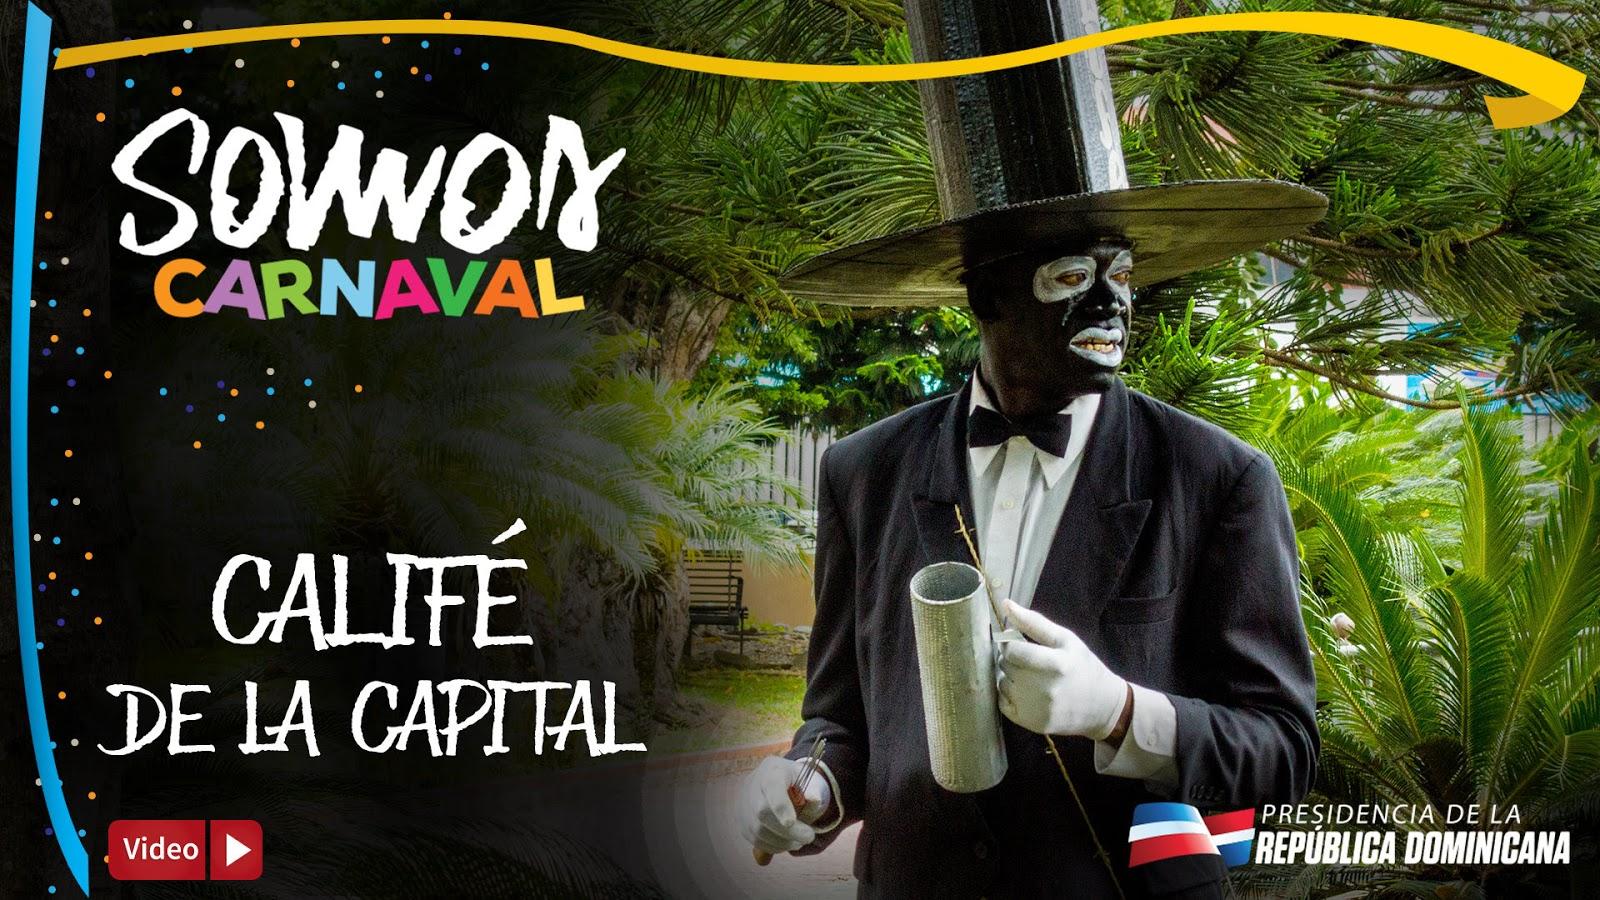 VIDEO: Califé de La Capital. Somos carnaval